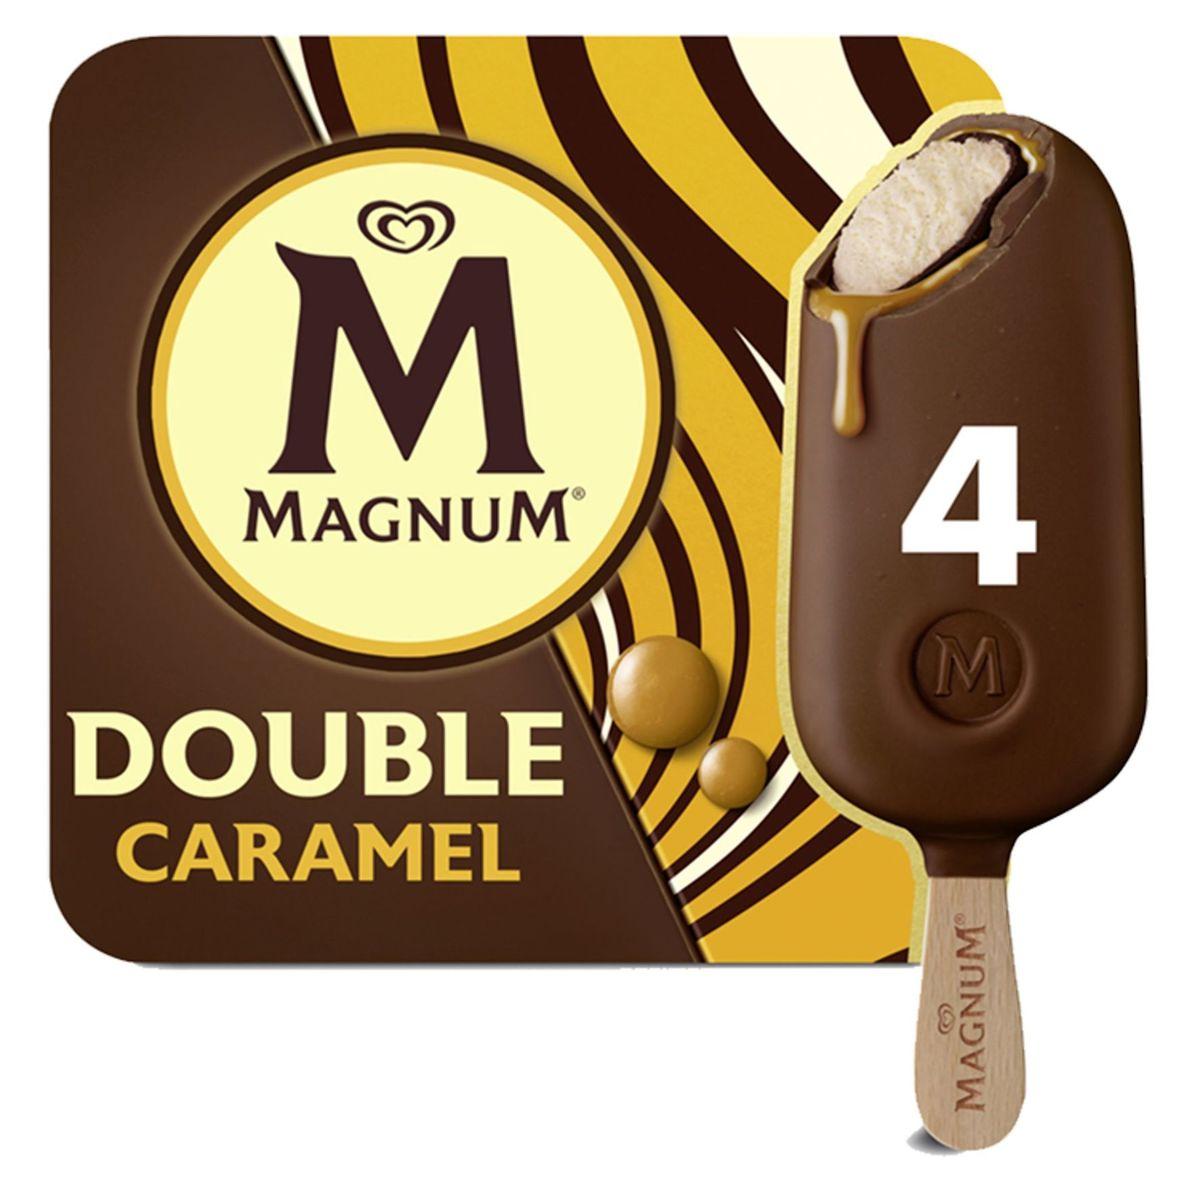 Magnum Ola Ijs Multipack Double Caramel 4 x 88 ml